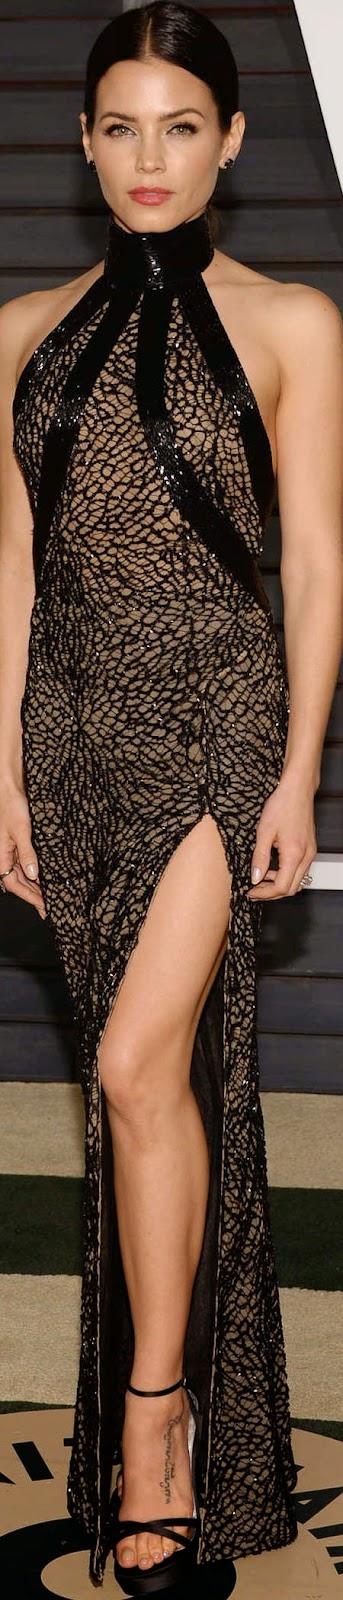 Vanity Fair Oscar Party Jennifer Dewan Tatum